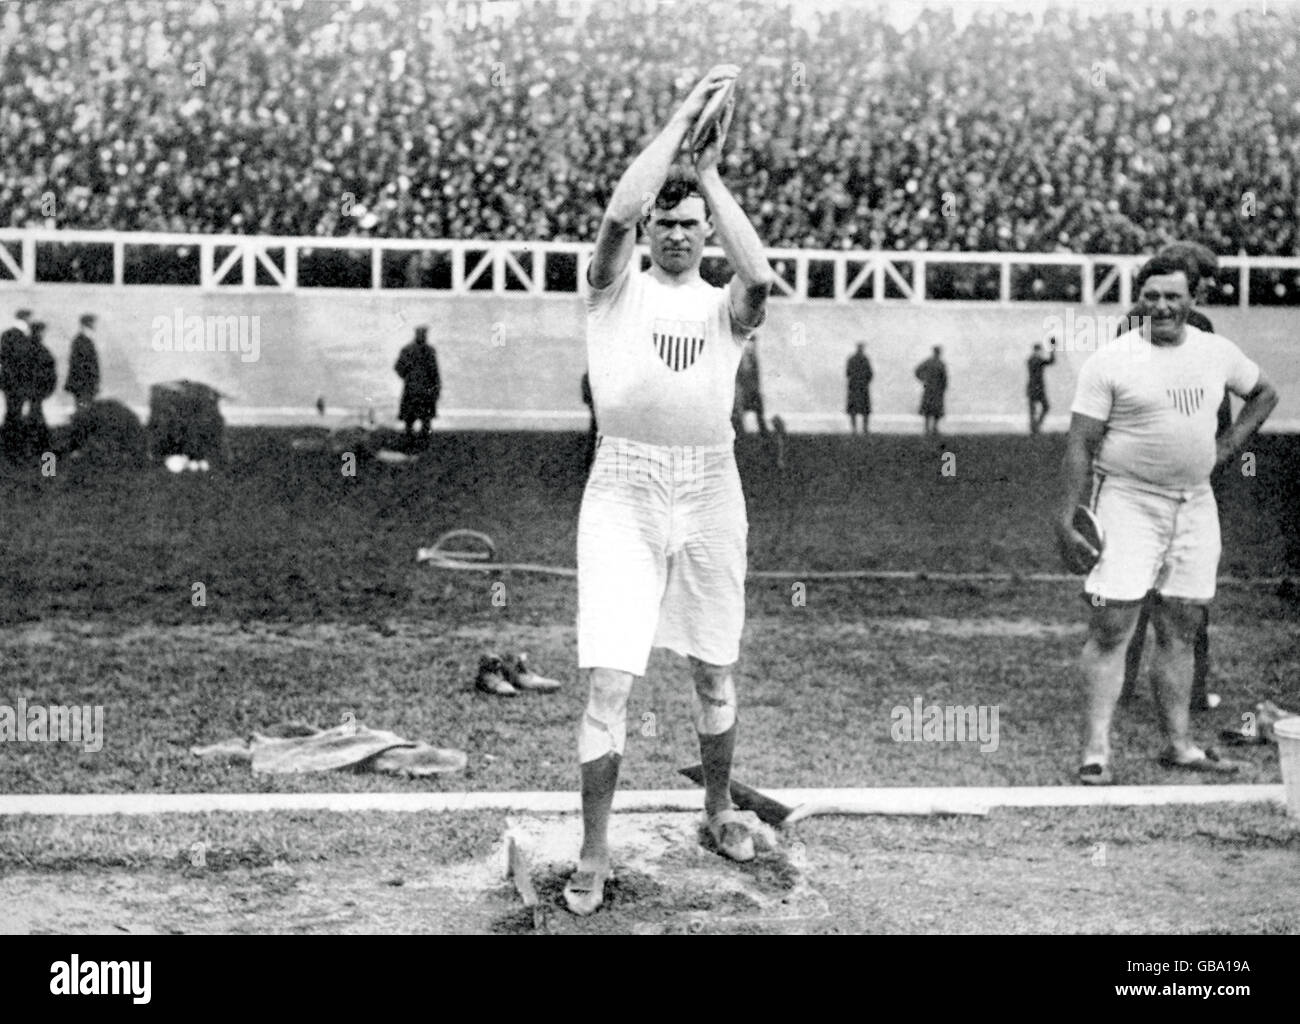 Athletics - London Olympic Games 1908 - Men's Discus - Stock Image